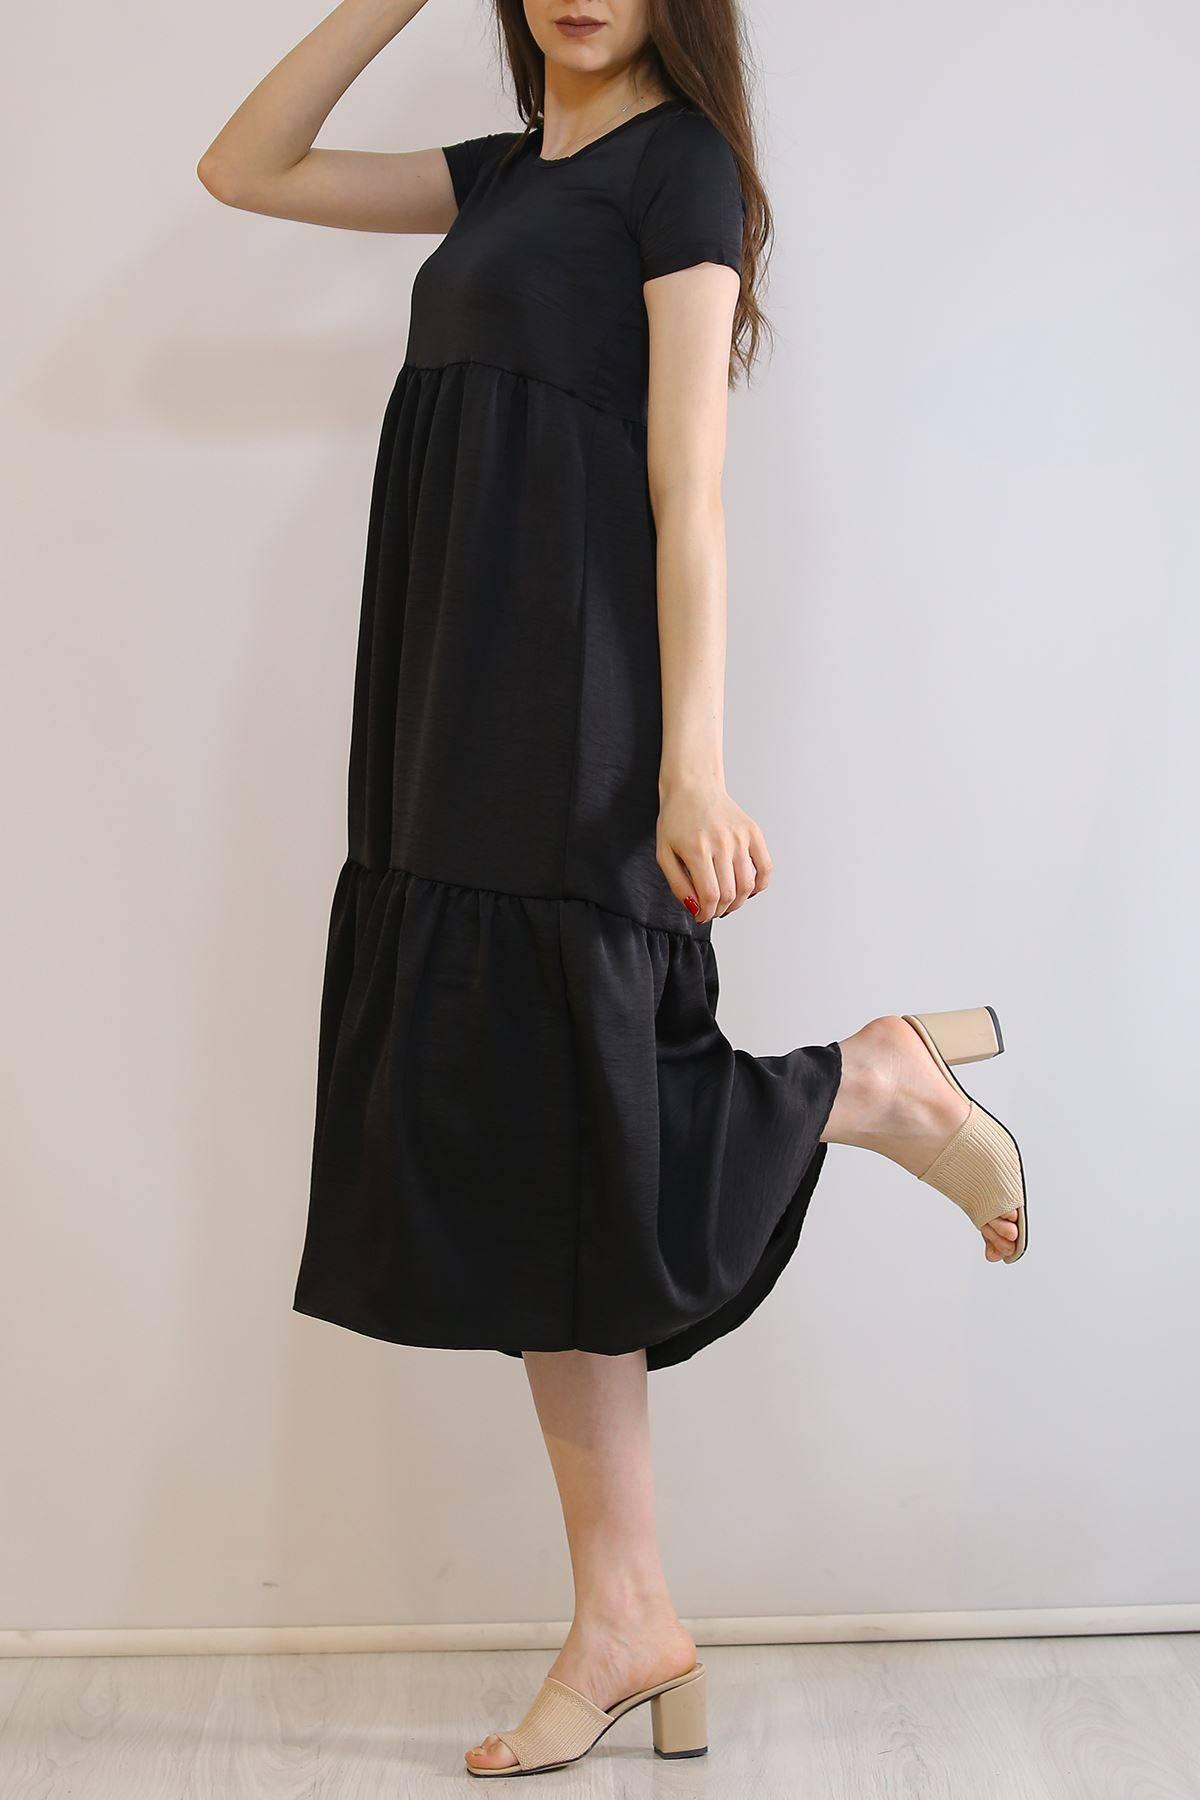 Ayrobin Elbise Siyah - 6023.1247.